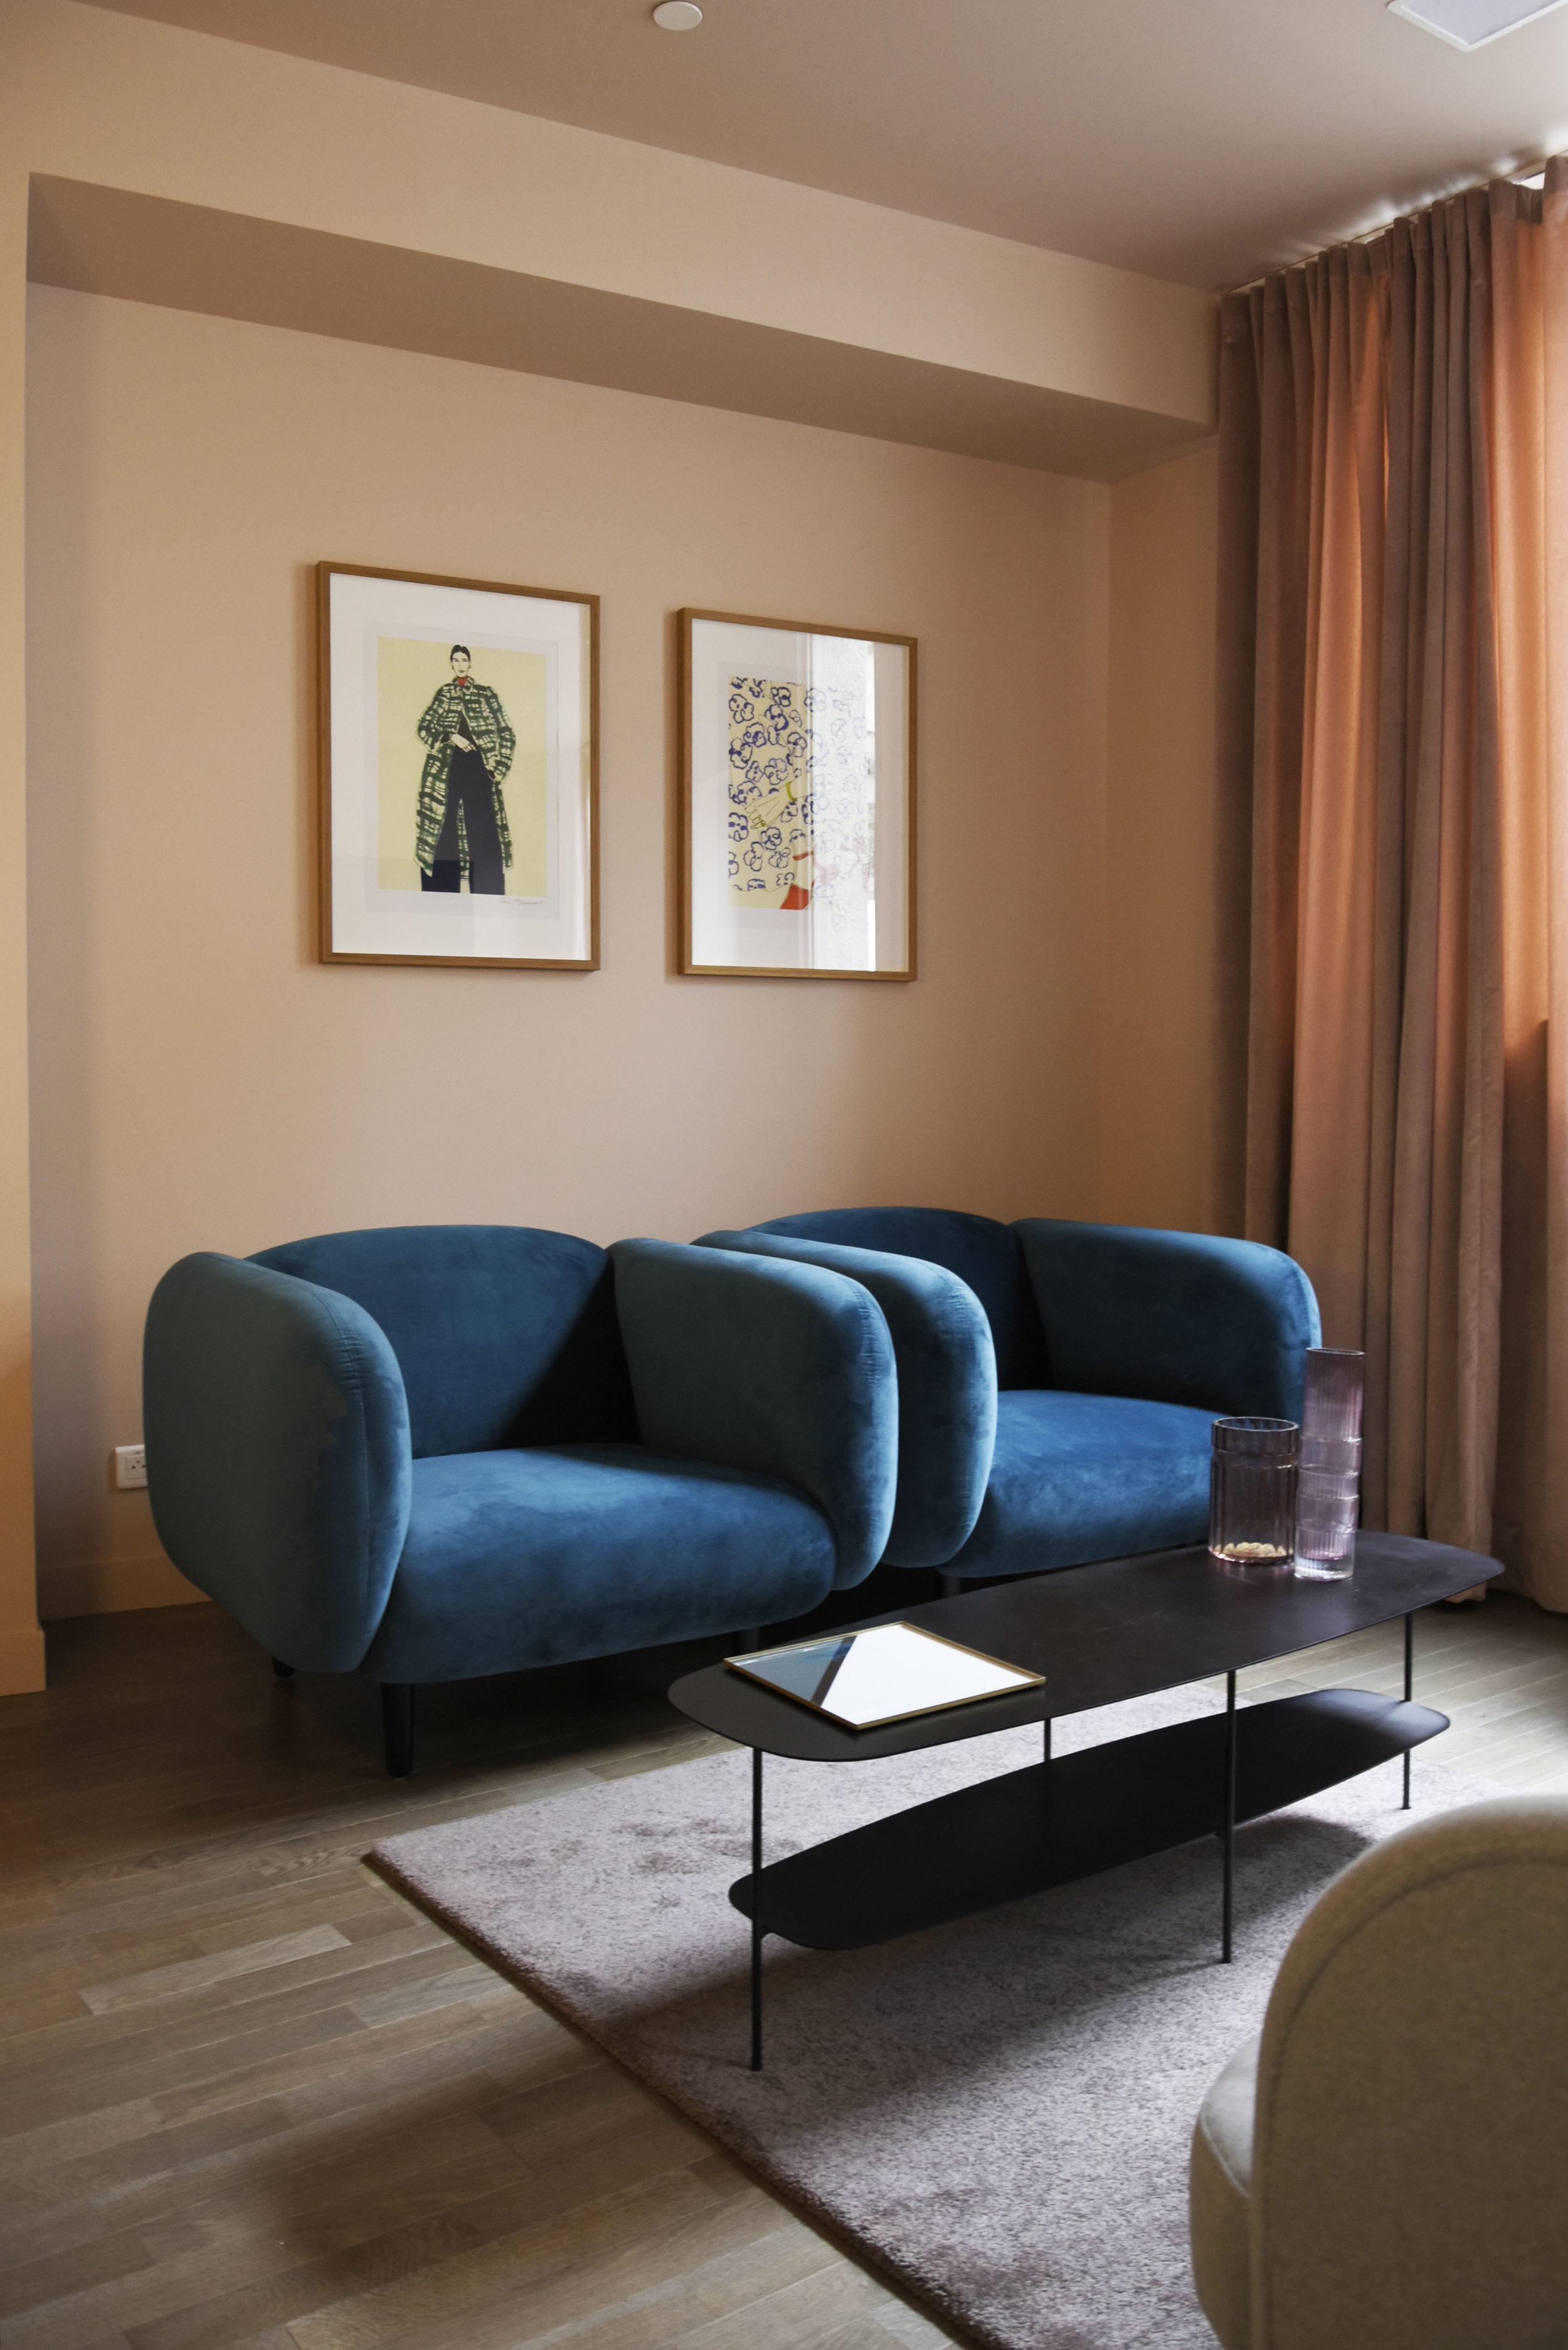 GALERIE LAFAYETTE espace client premium / MOIRA armchair, ONDIN vase